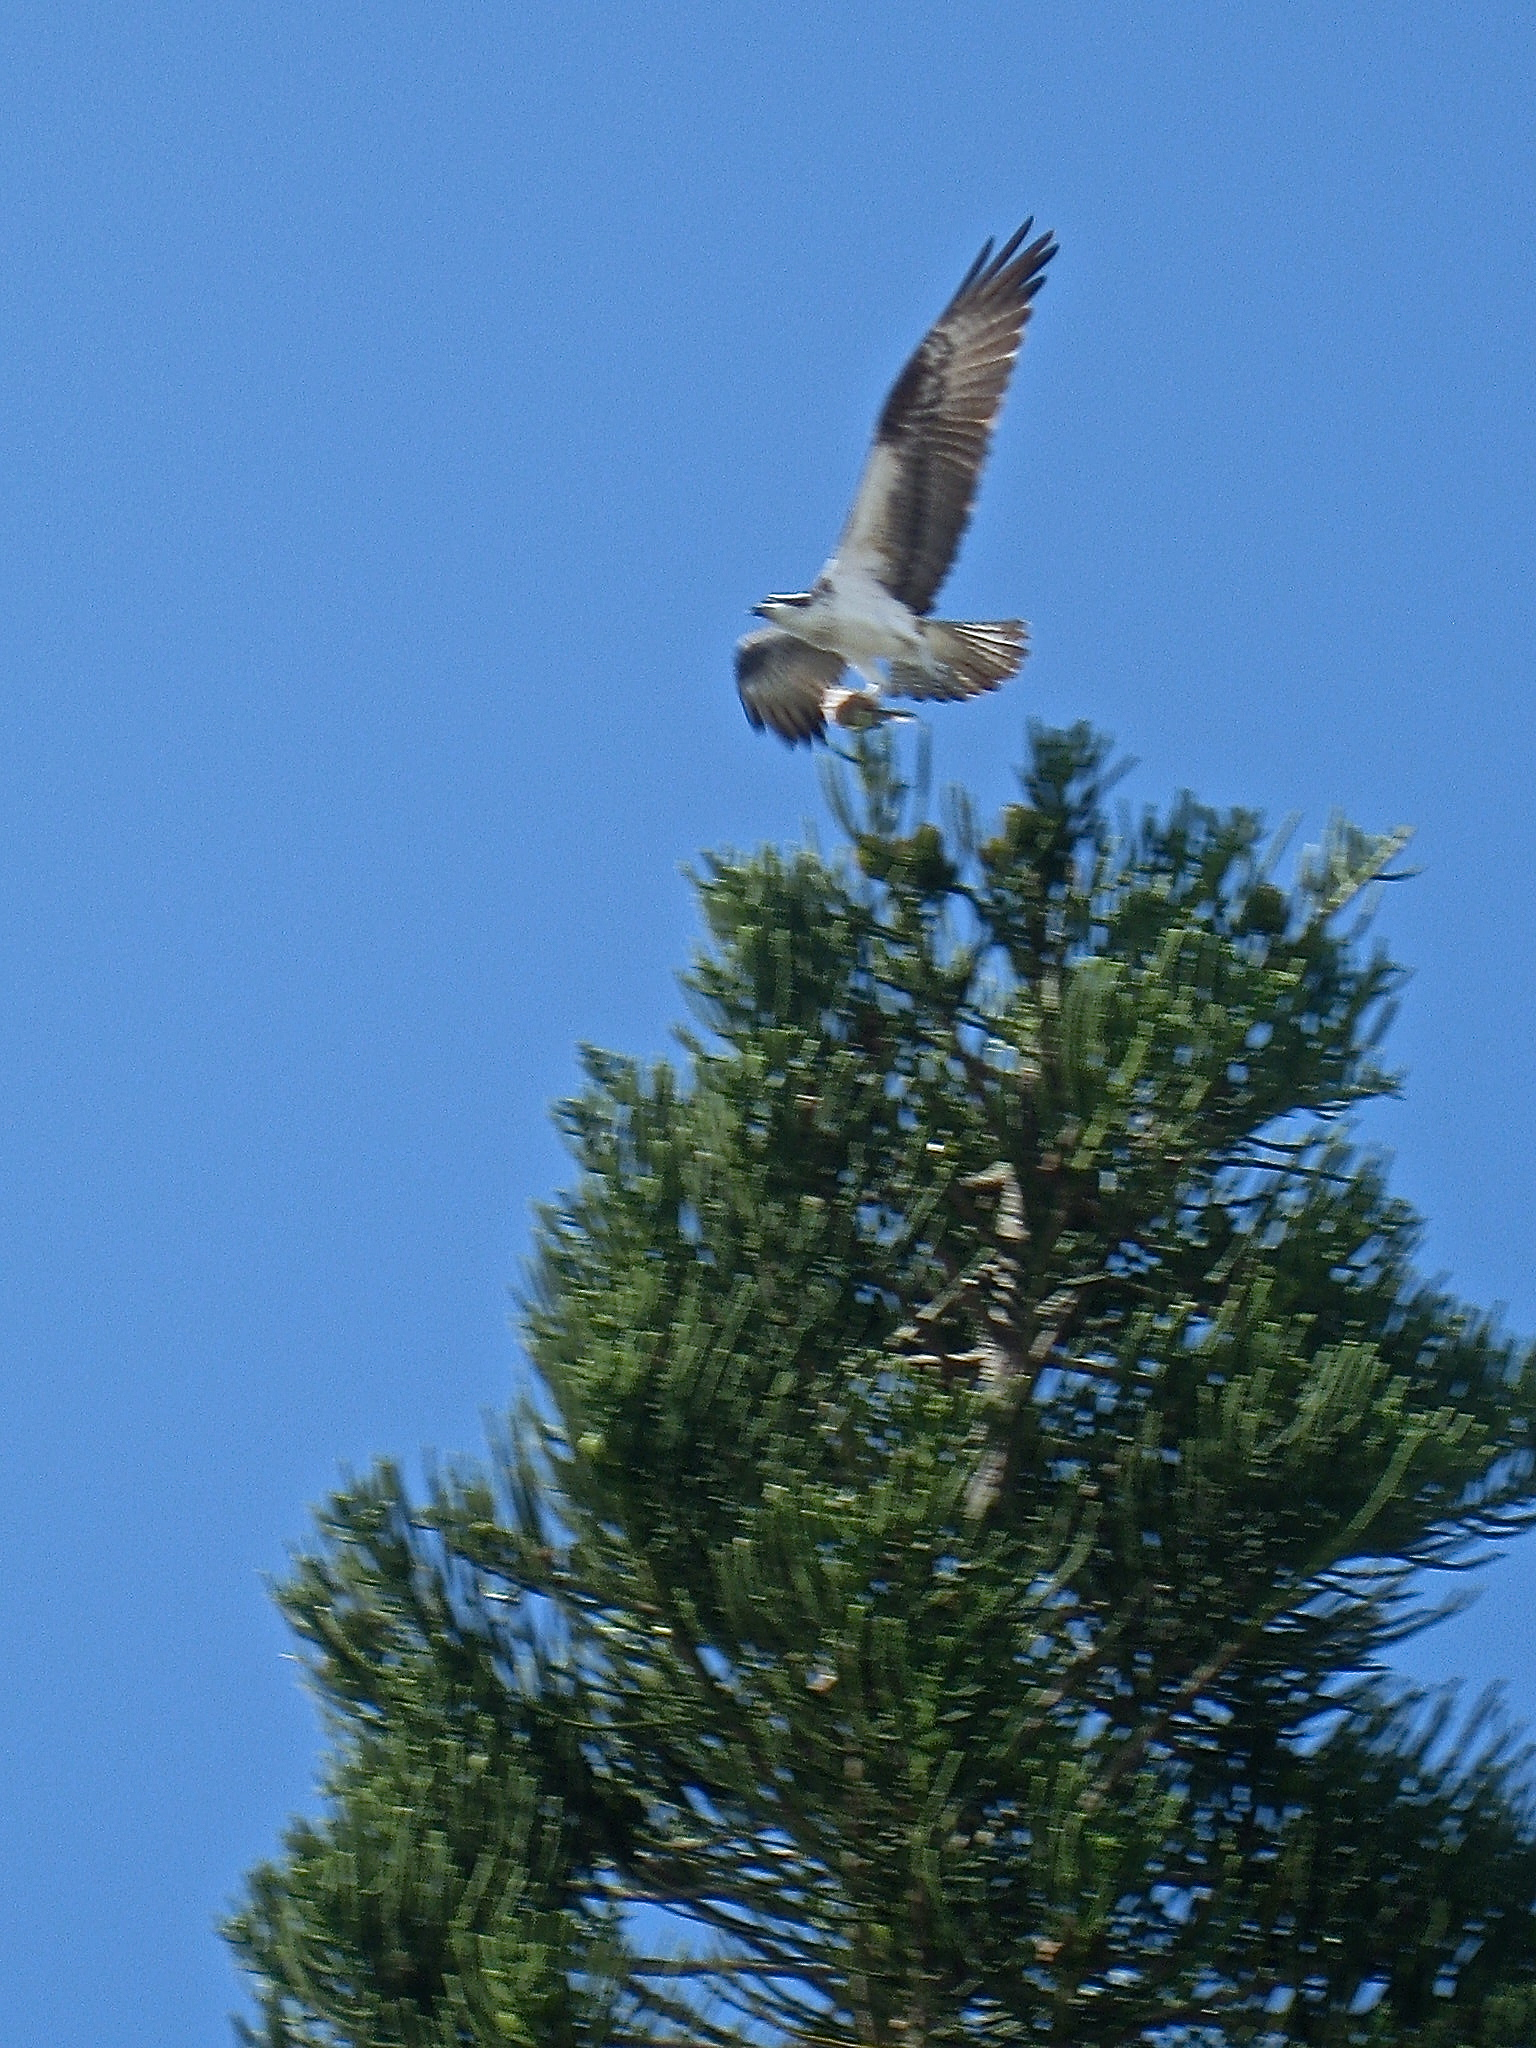 Osprey returning to nest in pine tree in Florida